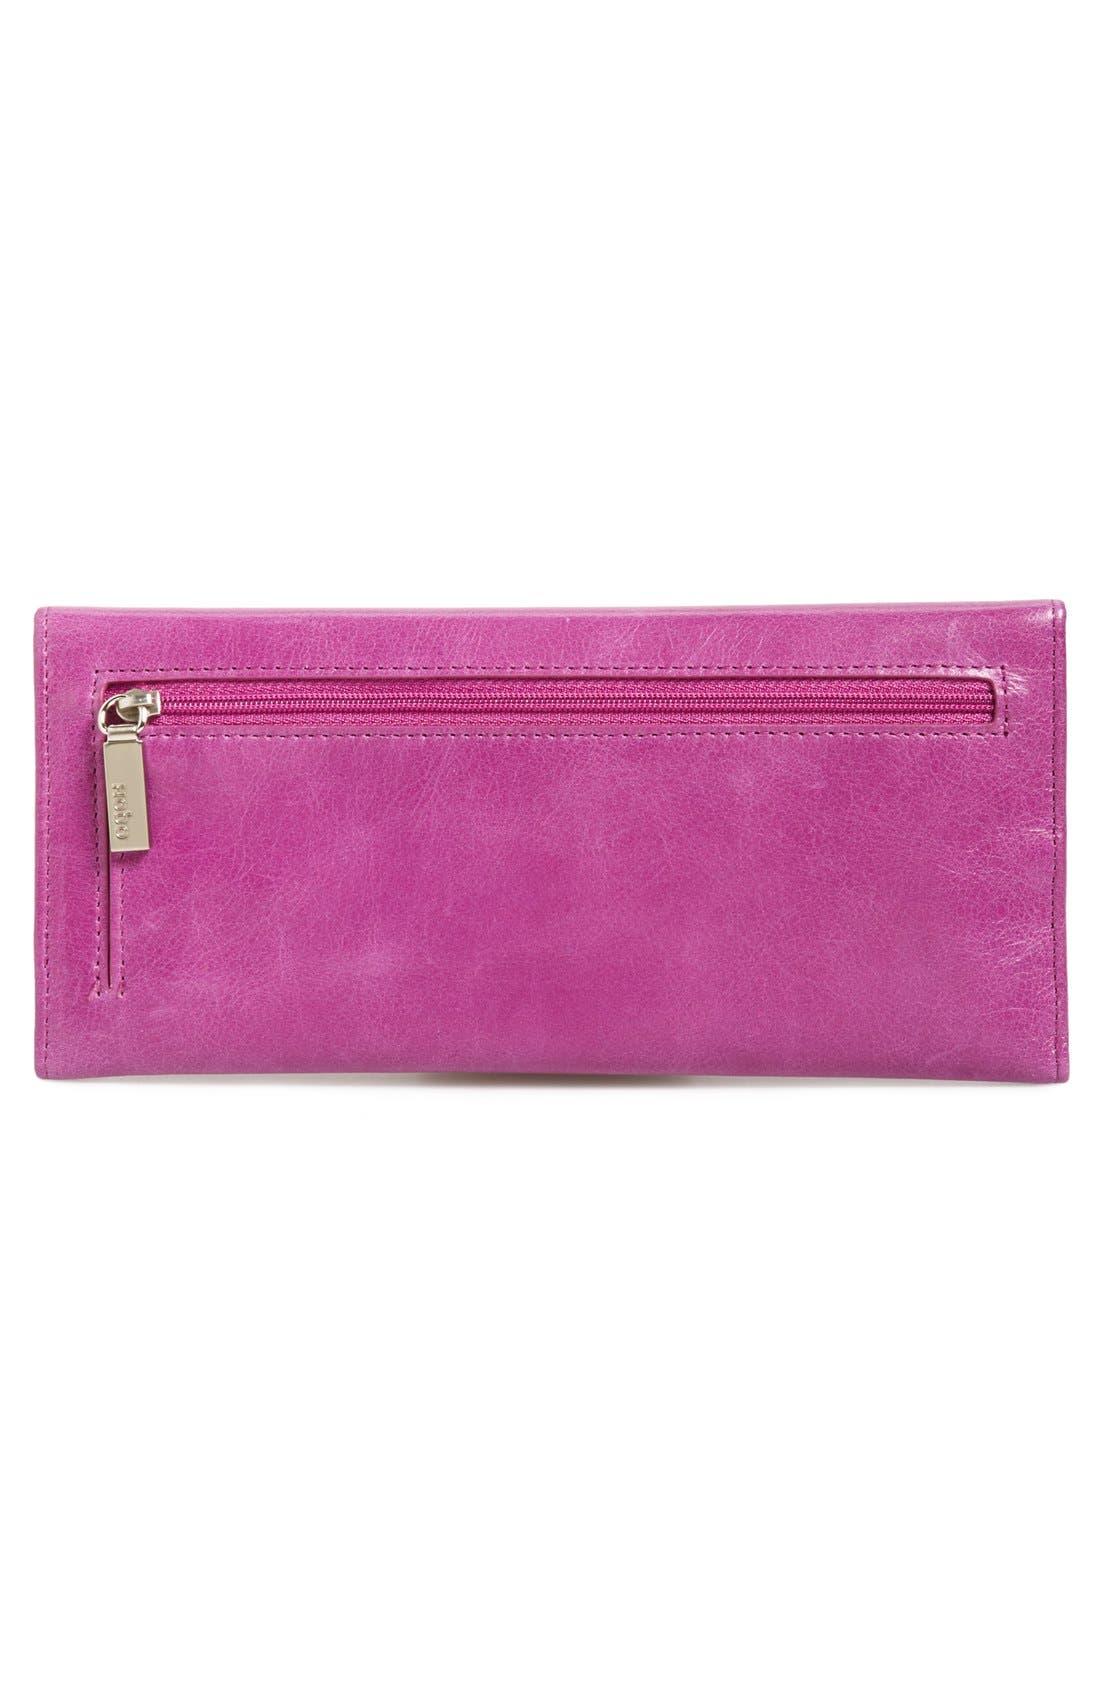 'Sadie' Leather Wallet,                             Alternate thumbnail 101, color,